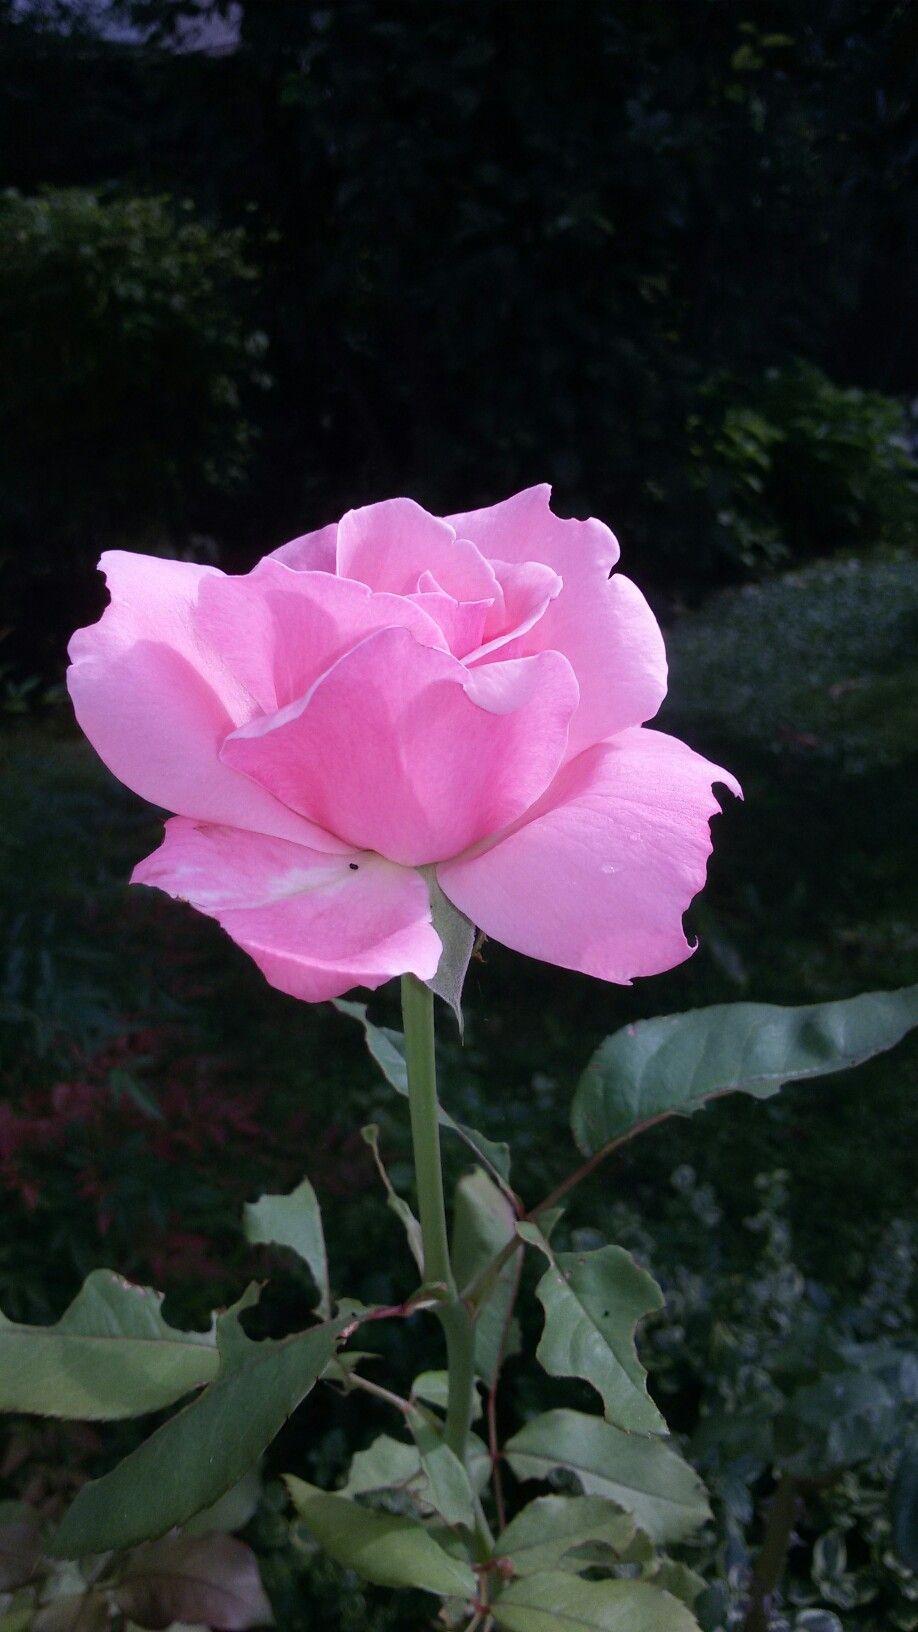 #Rose #pink #flower #beautiful #nature ♡